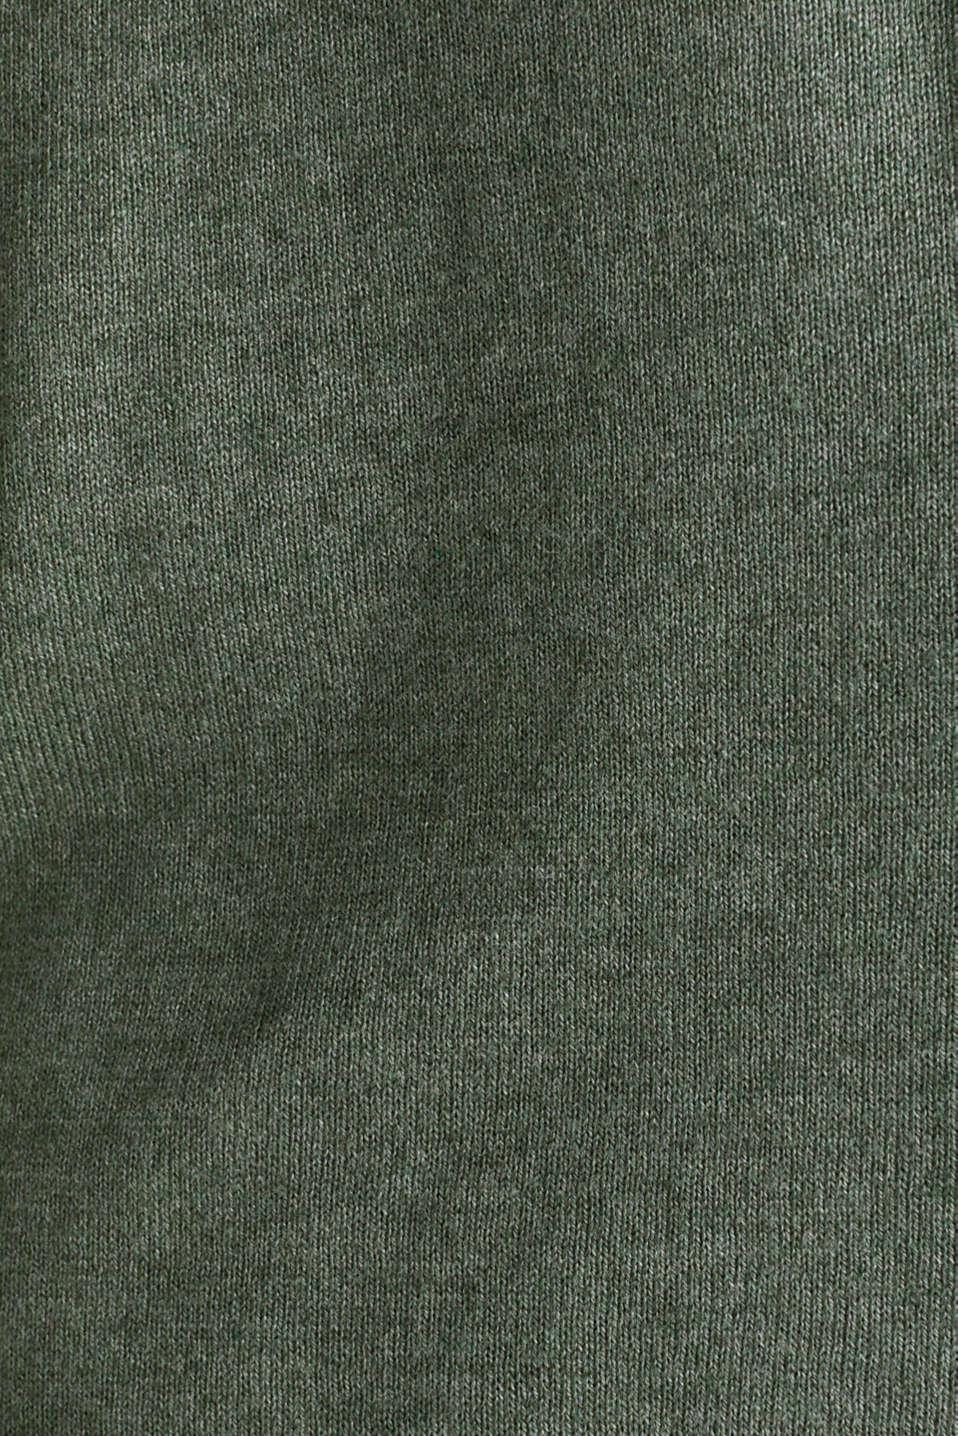 Fine-knit blended cotton cardigan, KHAKI GREEN 5, detail image number 4